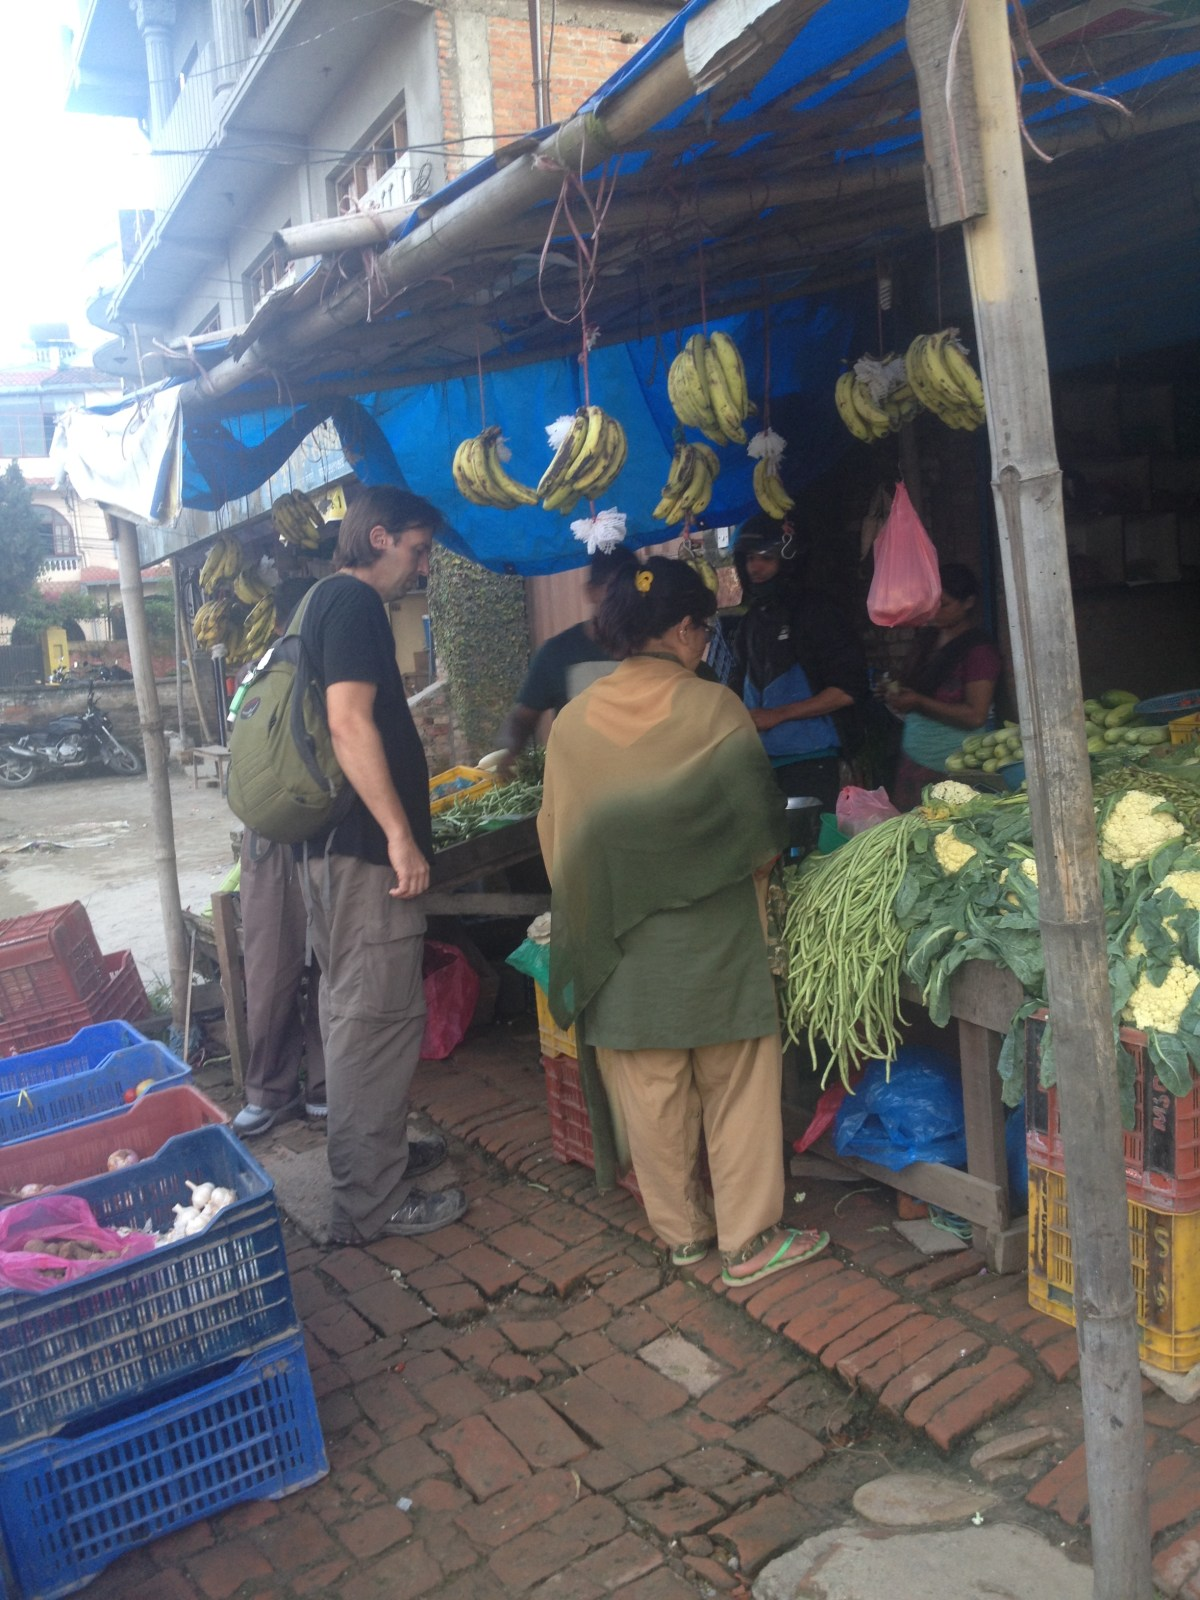 Nepal Travel: Kathmandu Grocery Store